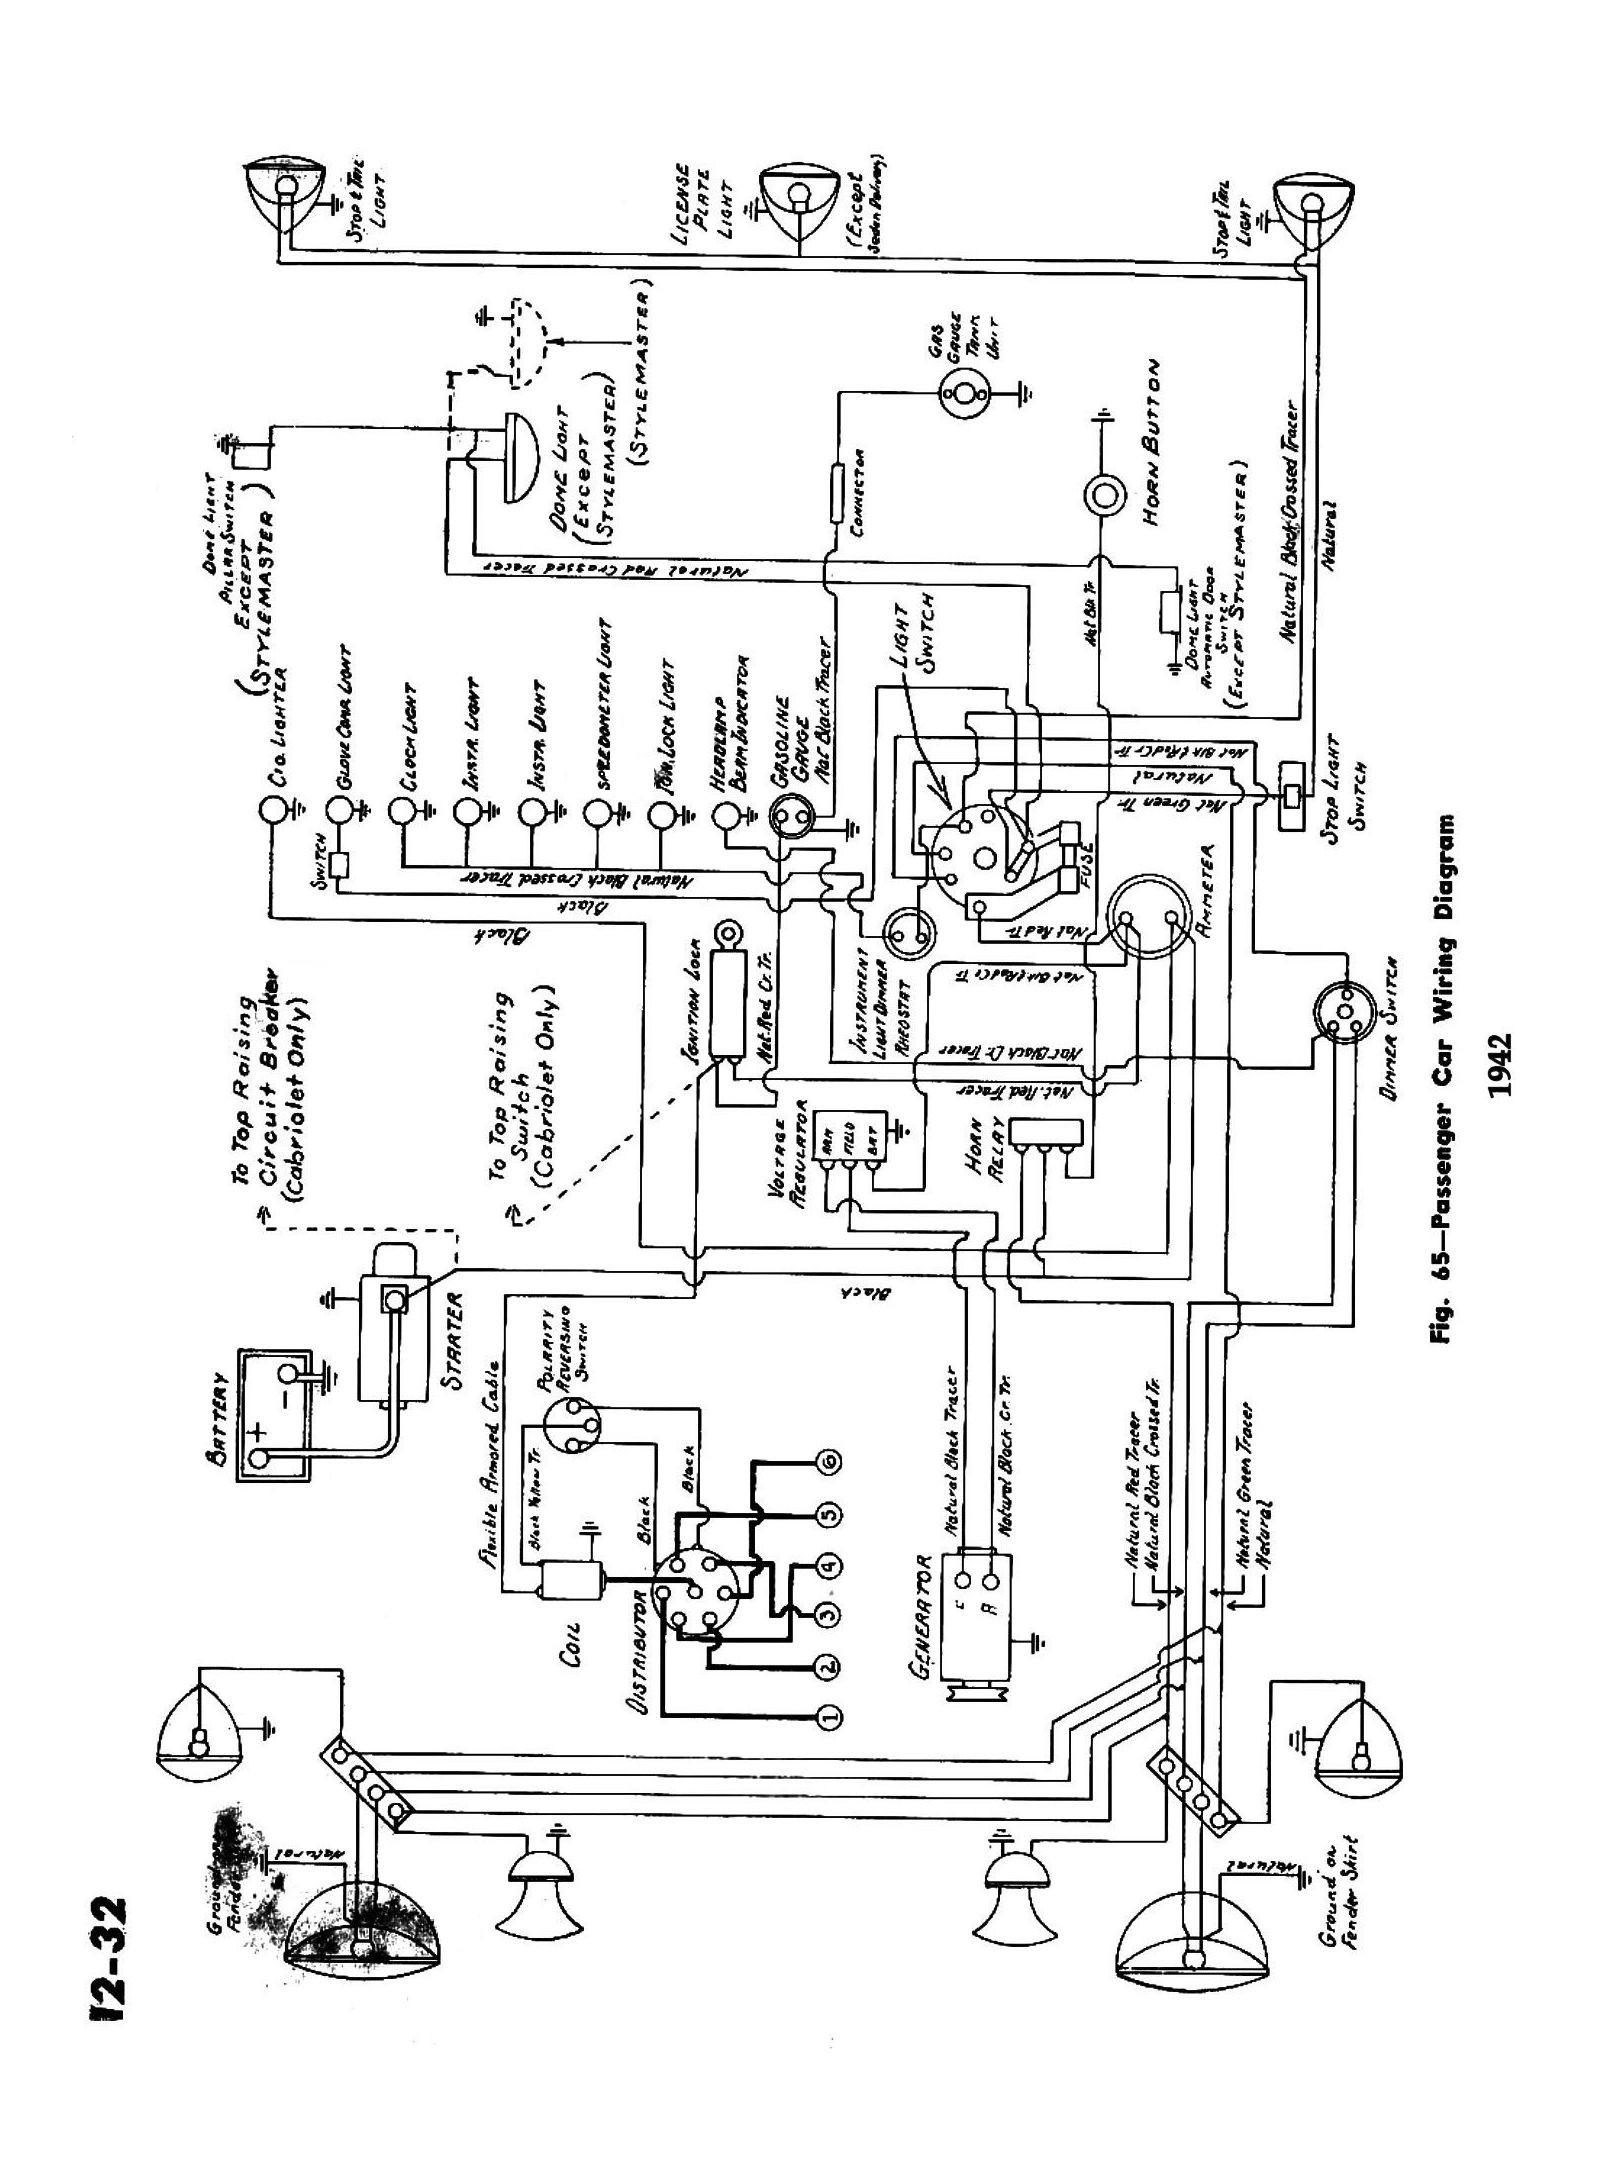 Mins Starter Wiring Diagram Start Building A Mower Generator Detailed Schematics Rh Jvpacks Com Tractor